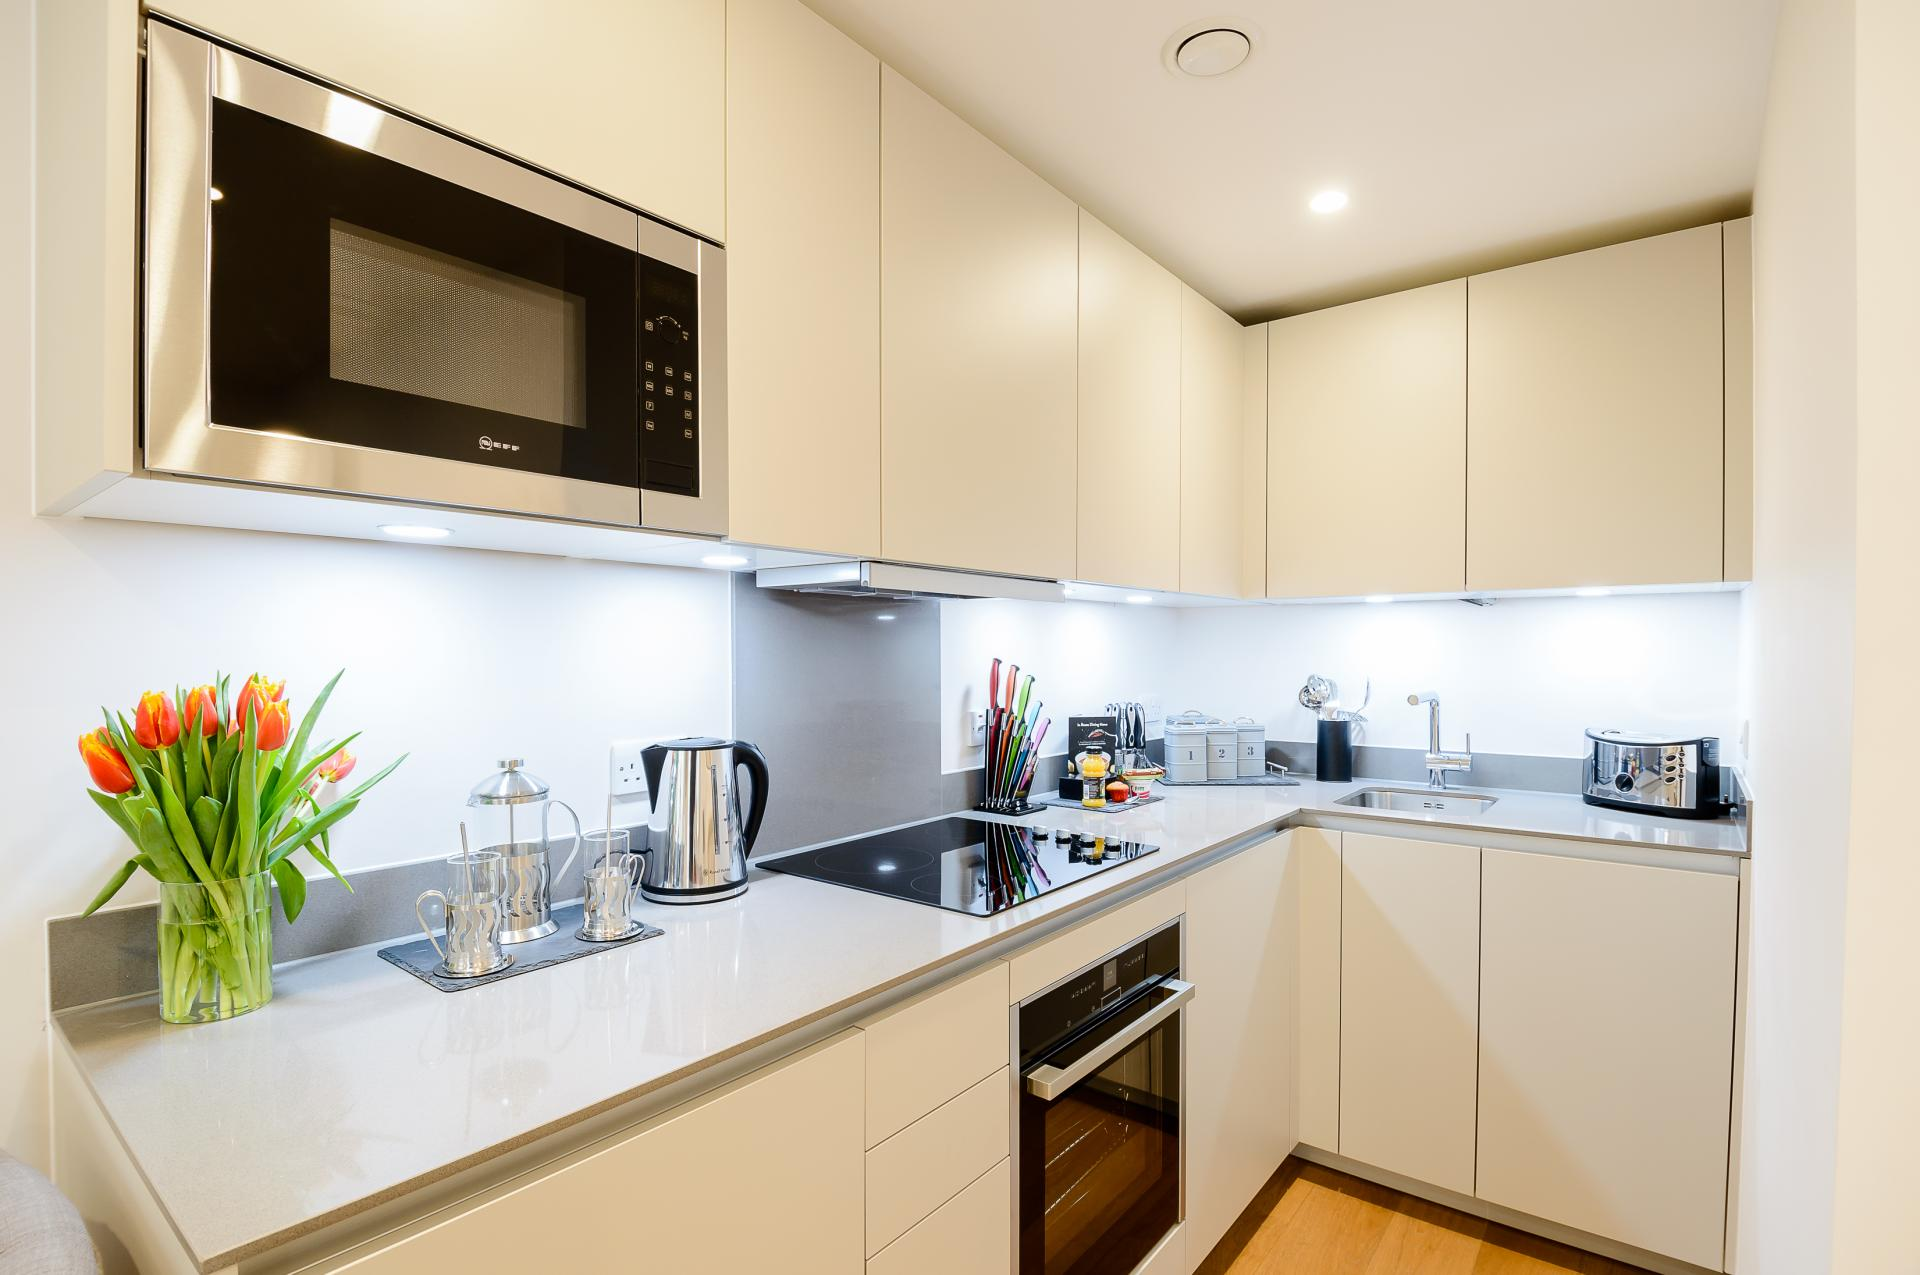 Kitchen at LAK Serviced Apartments, Gloucester Road, London - Citybase Apartments